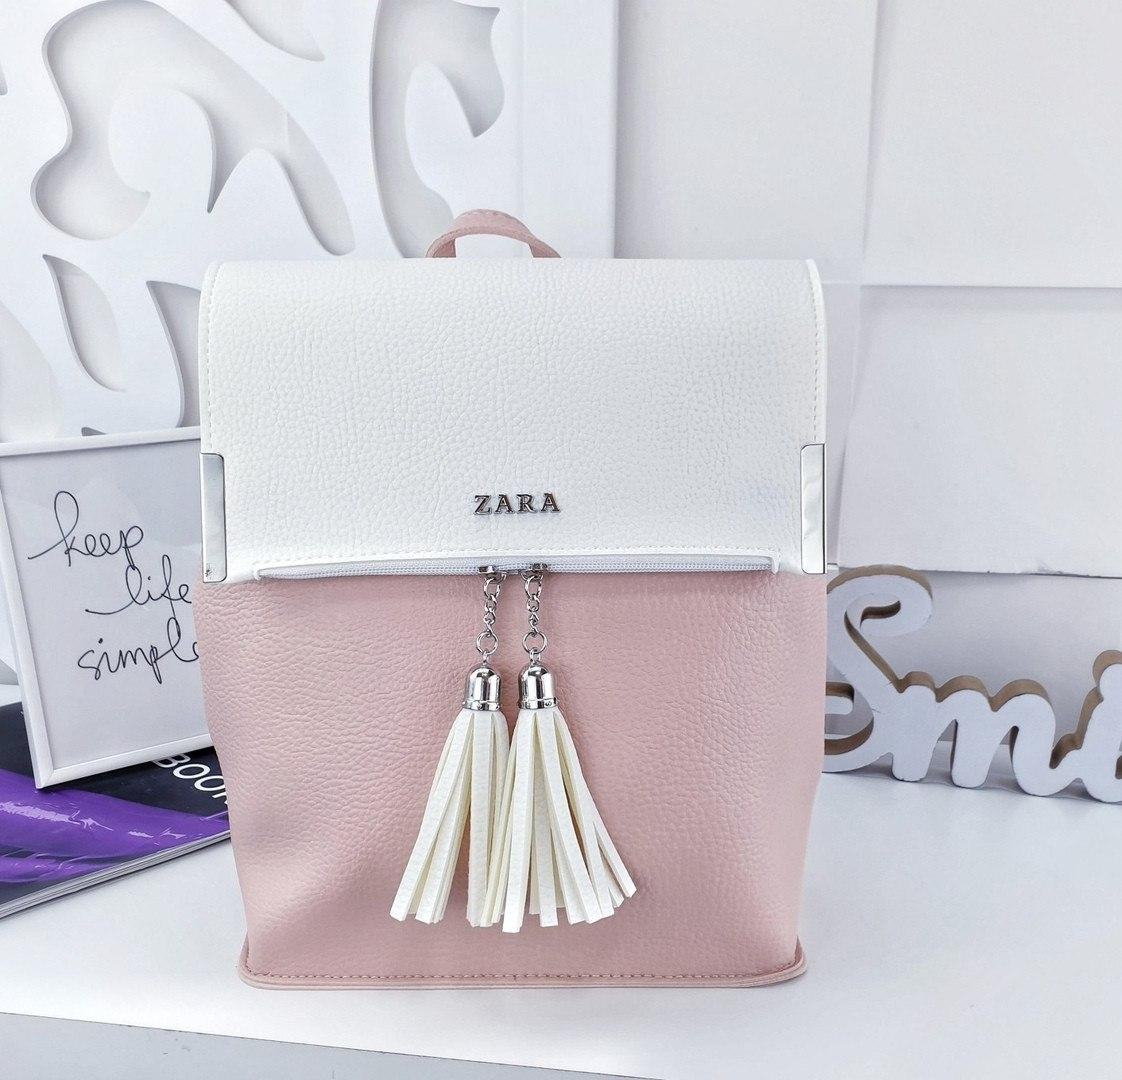 5cbe4e1ecce0 Женский рюкзак-сумка в стиле Zara бело-пудрового цвета с кисточками из  экокожи -